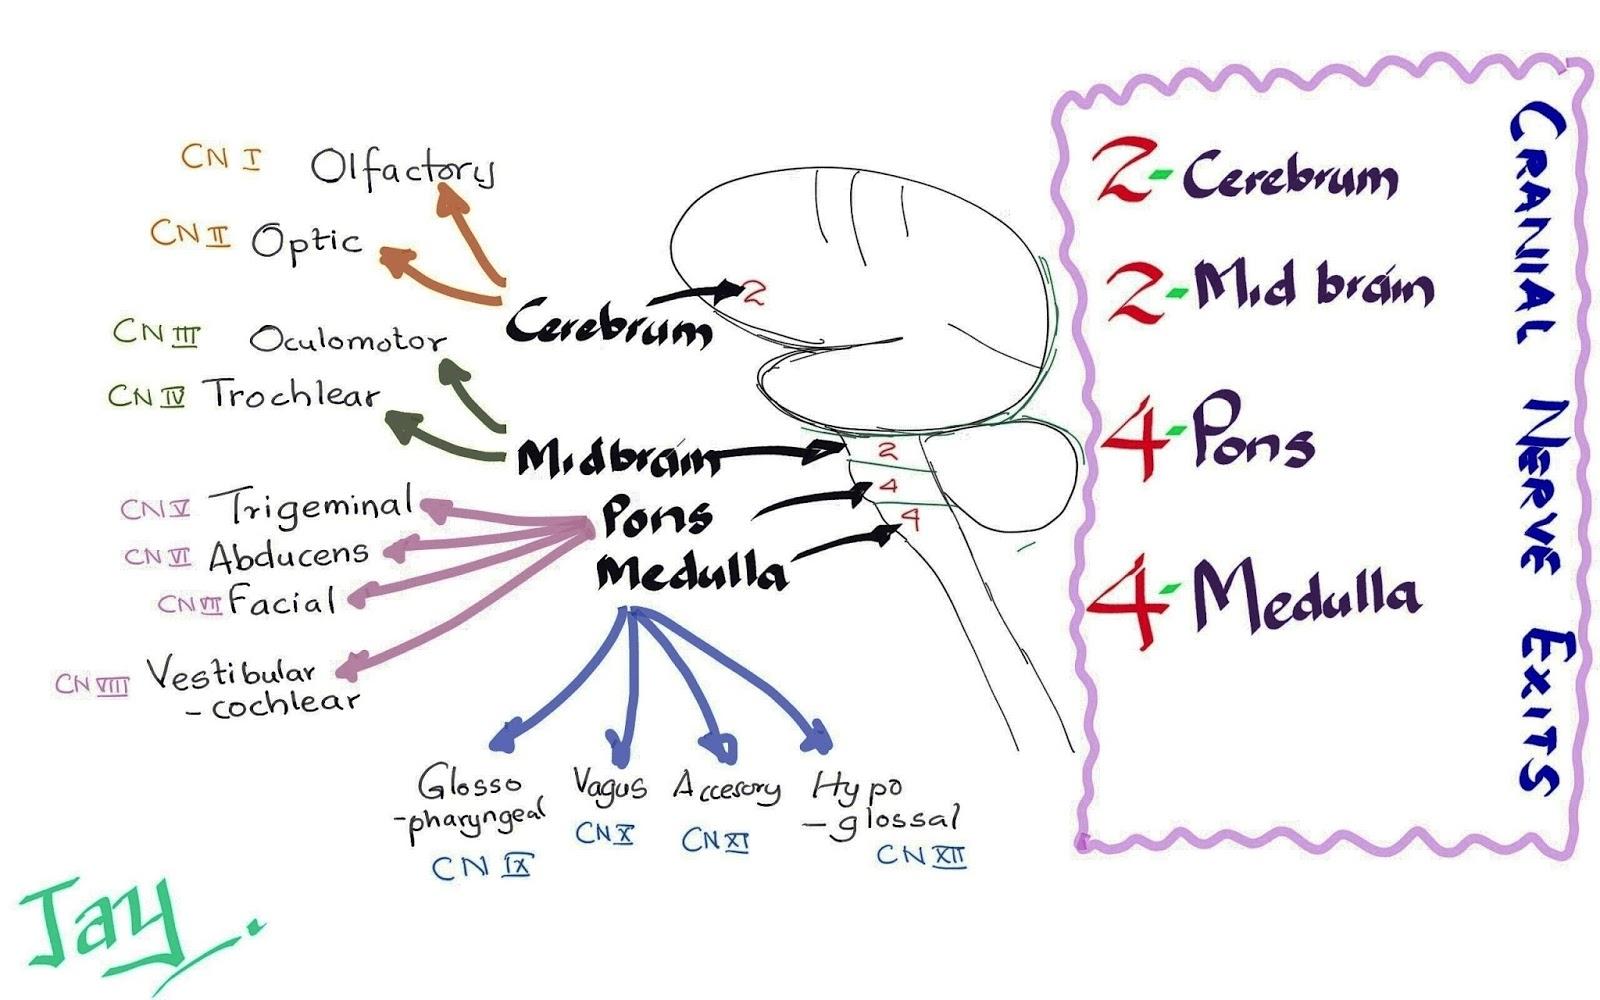 Medicowesome: Cranial Nerve Exits Mnemonic (2 2 4 4 )